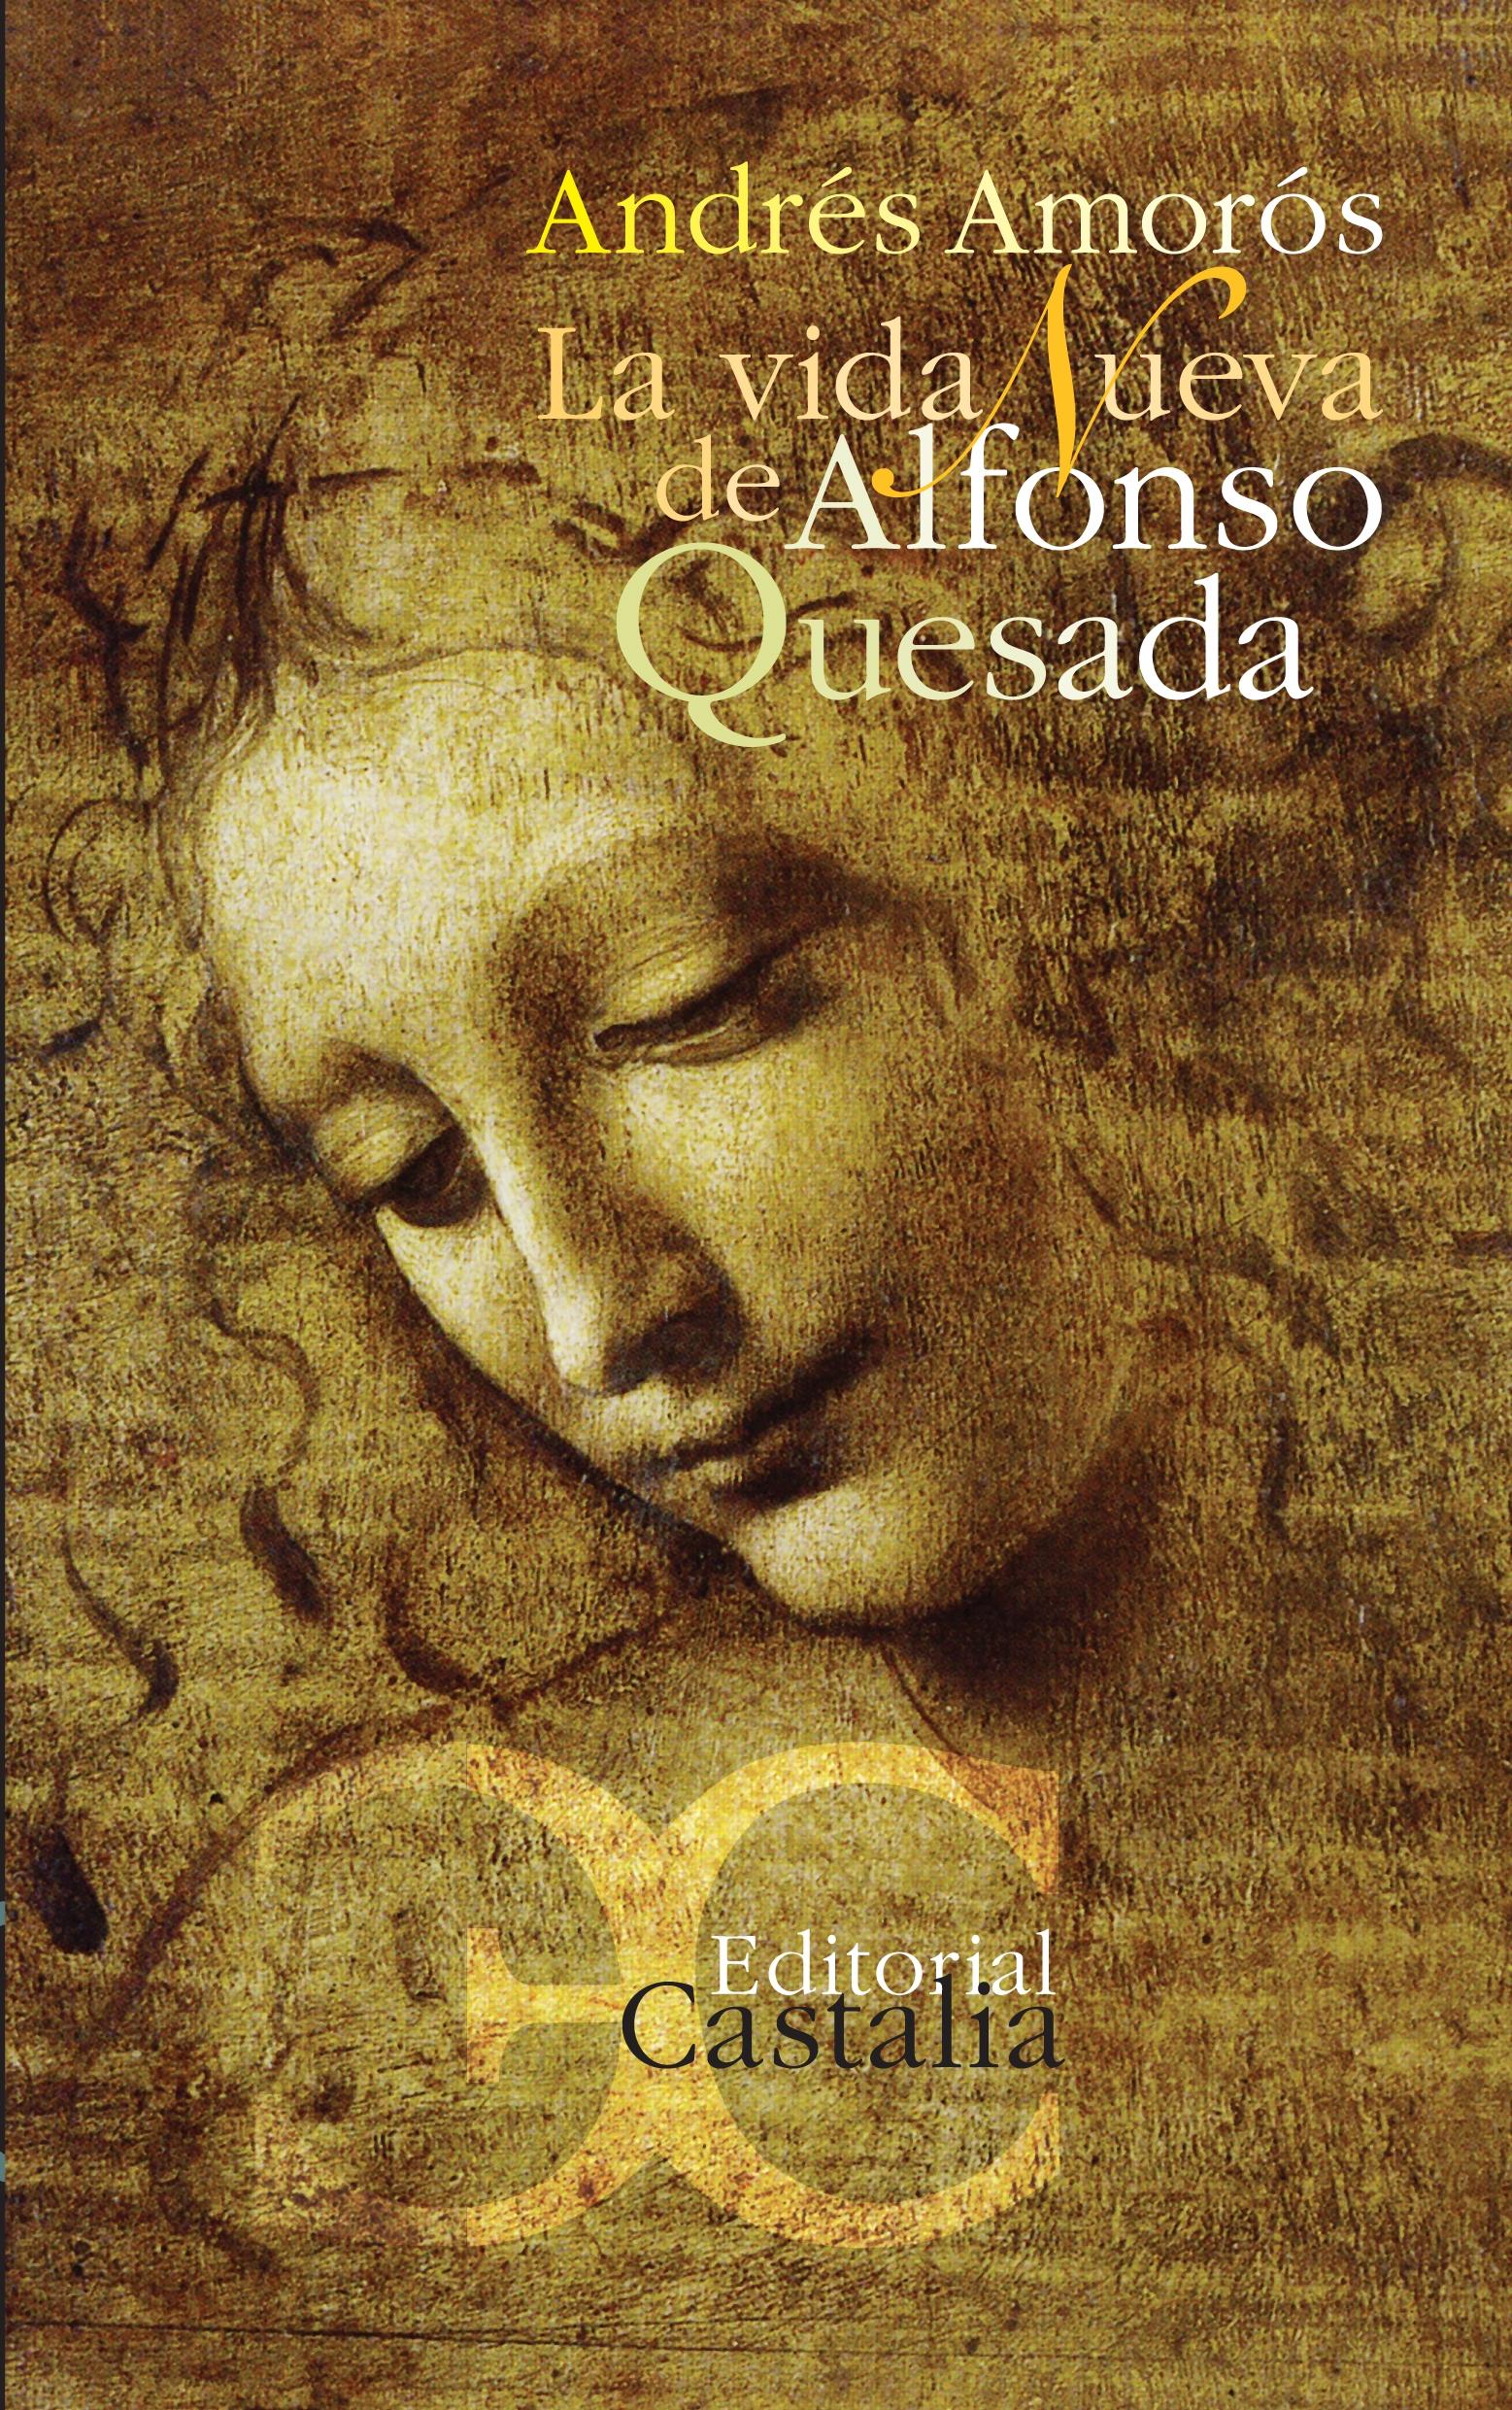 La vida nueva de Alfonso Quesada